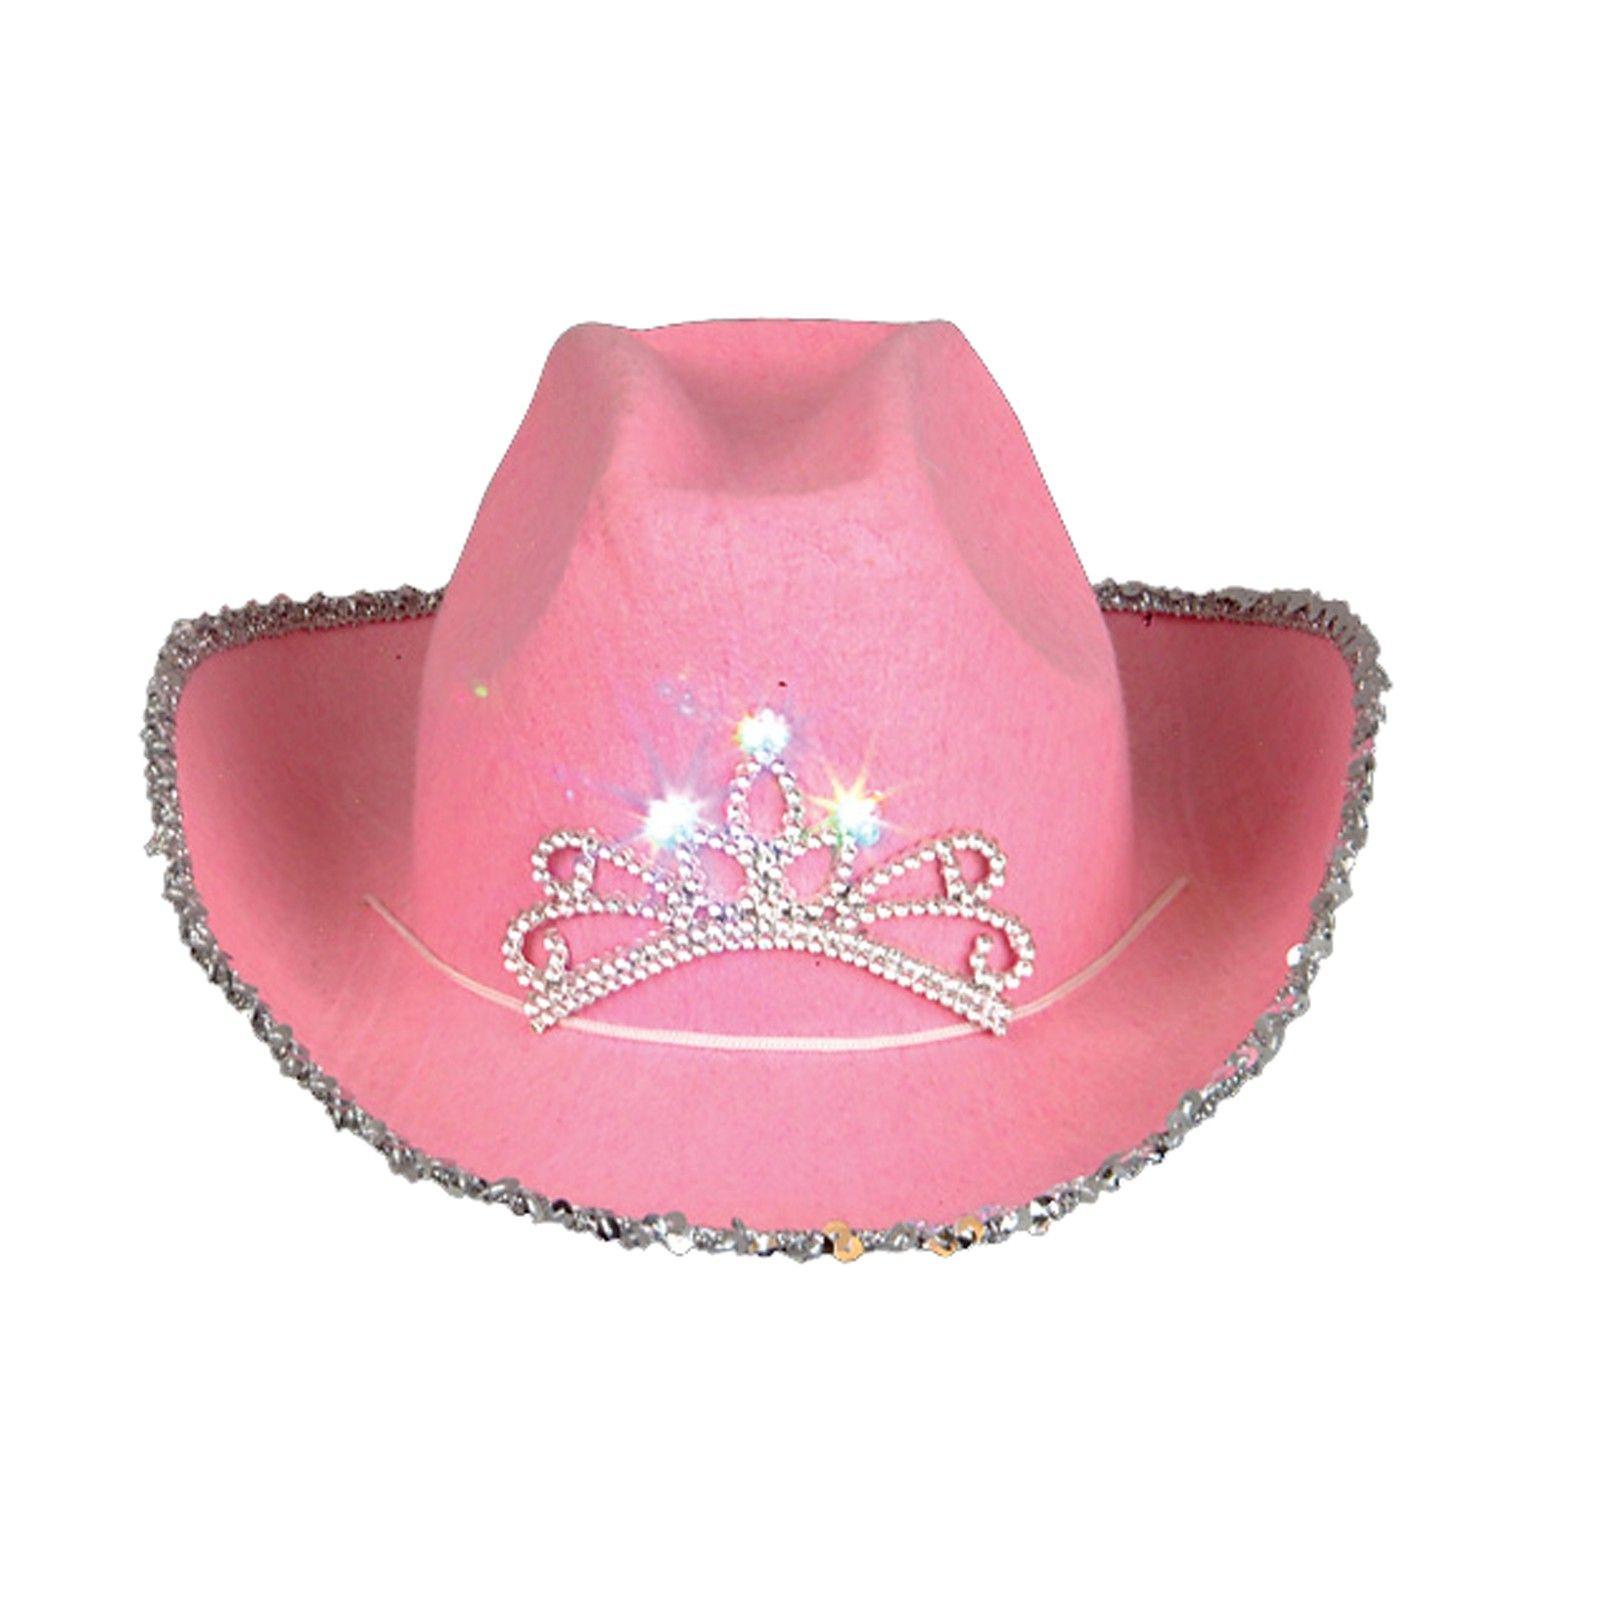 d9ac93cb64d1d Blinking Pink Tiara Cowboy Hat (Child)